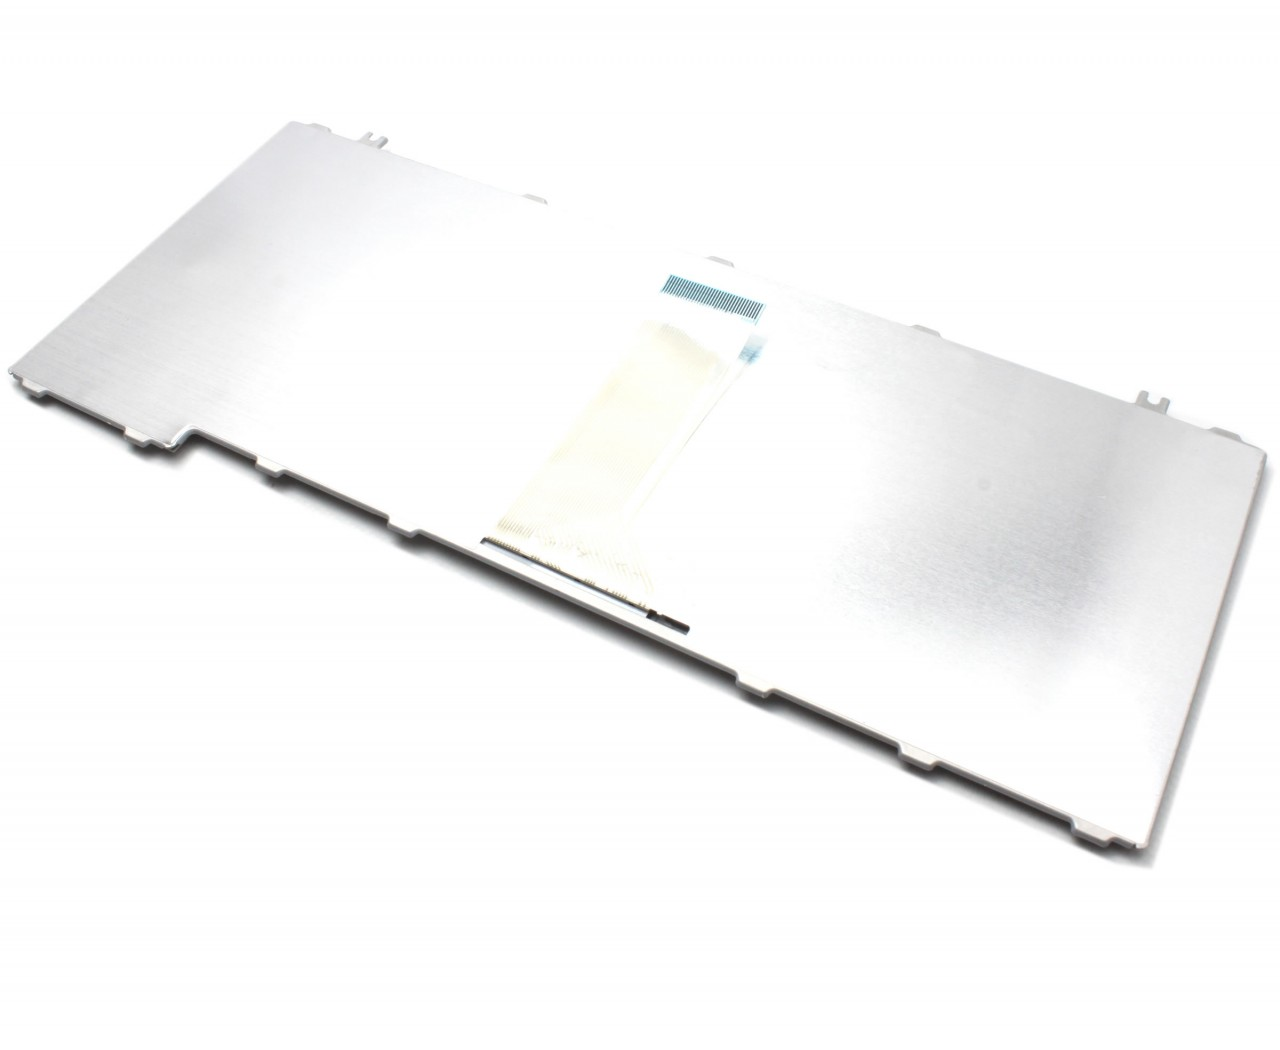 Tastatura Toshiba Satellite Pro L300 Alba imagine powerlaptop.ro 2021